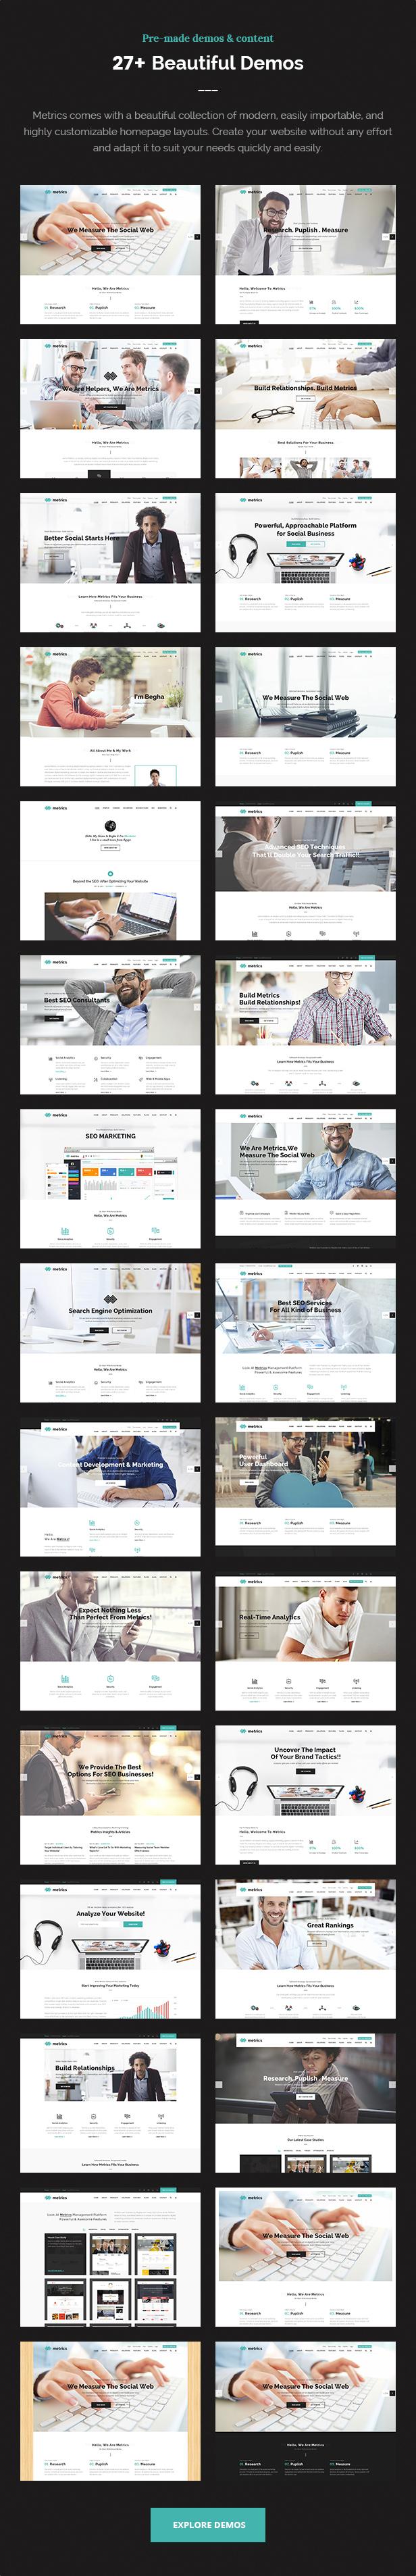 SEO Metrics - SEO, Digital Marketing, Social Media WordPress Theme - 5